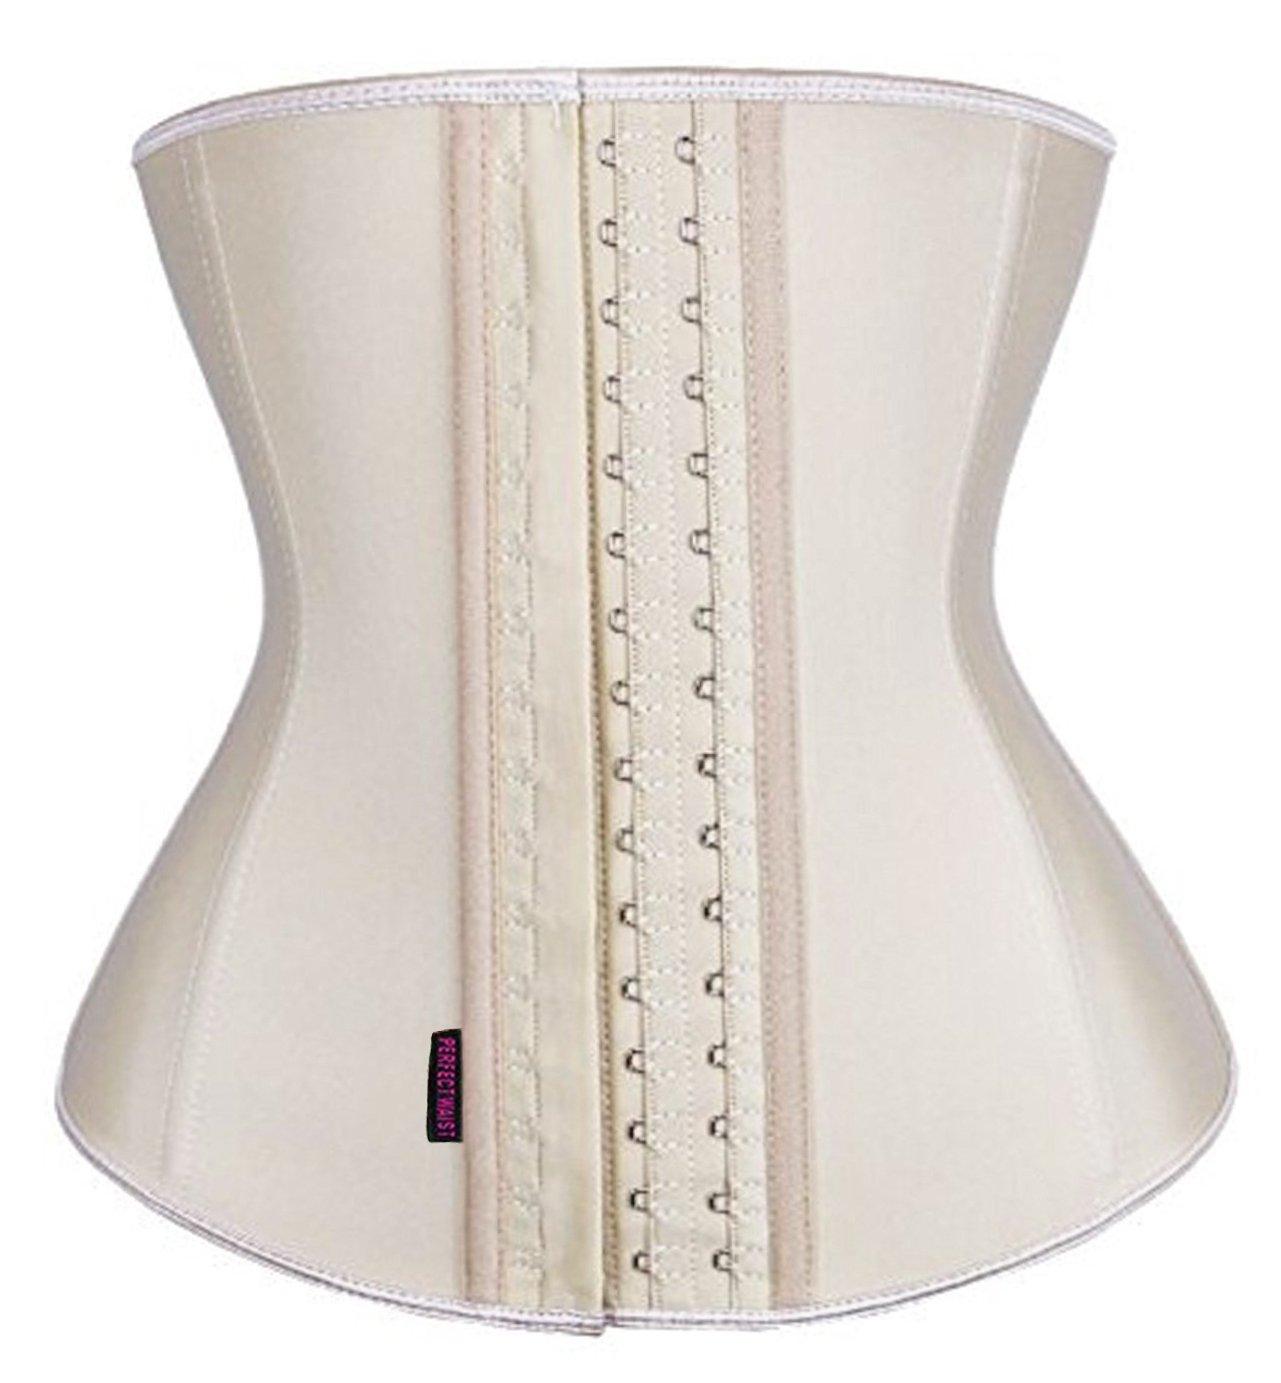 DILANNI Women's Waist Trainer Belt - Body Shaper Belt for an Hourglass Shaper Apricot M